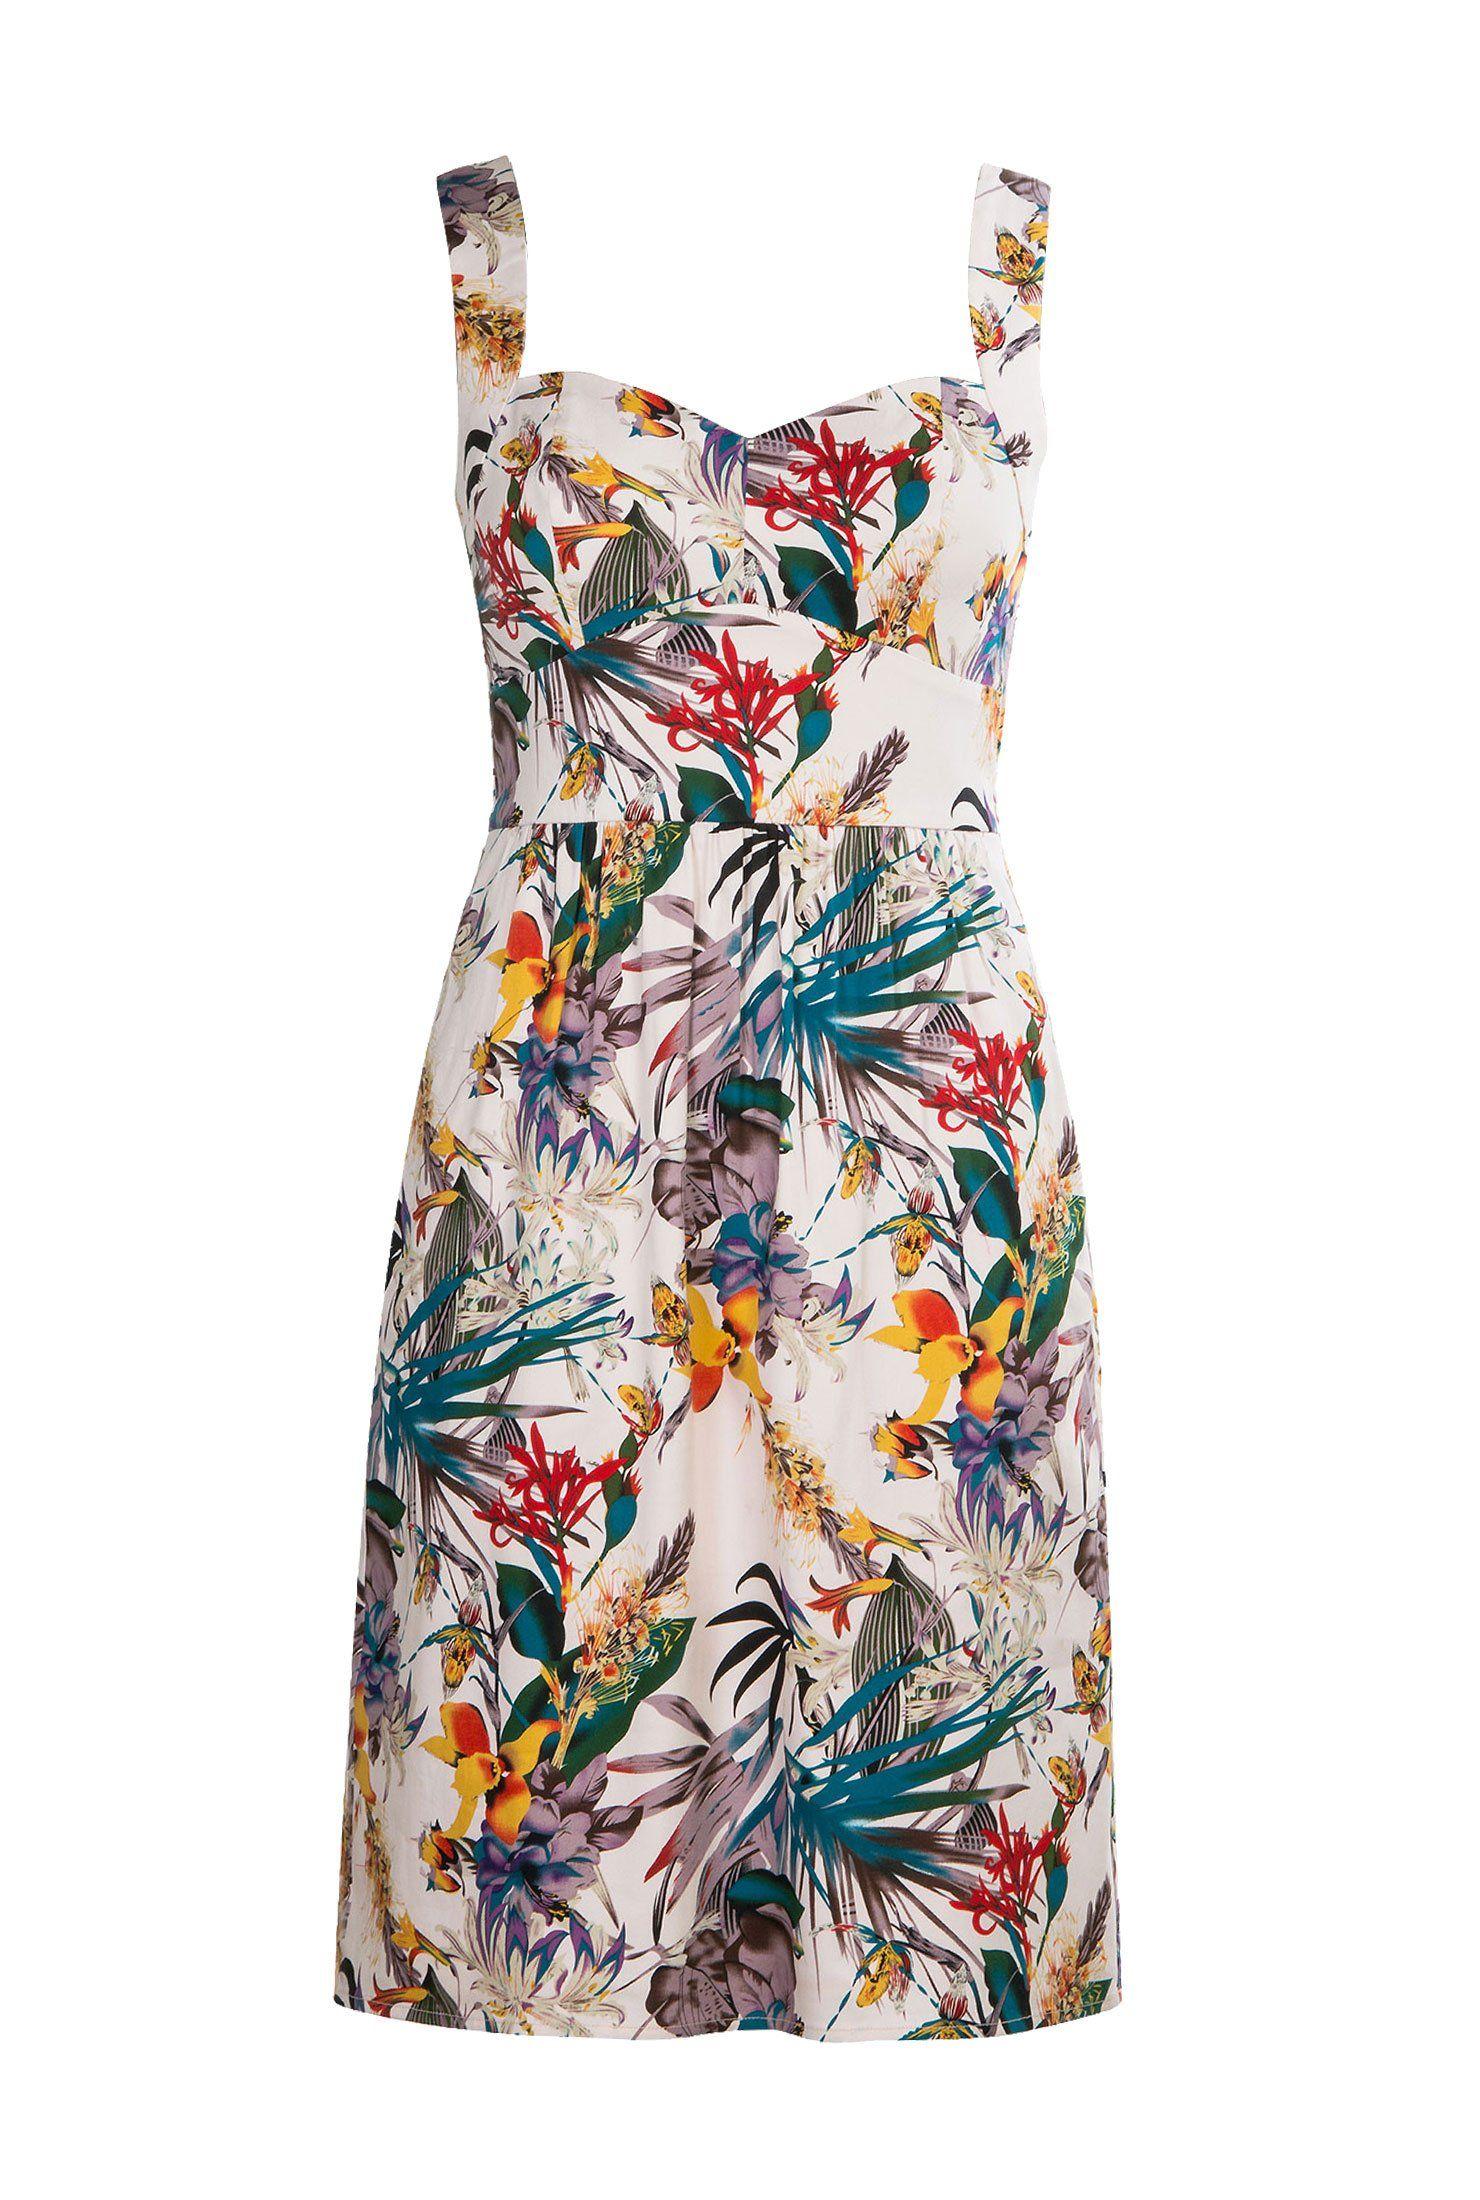 Eshakti Women S Her Fifties Tropical Fl Print Dress At Clothing